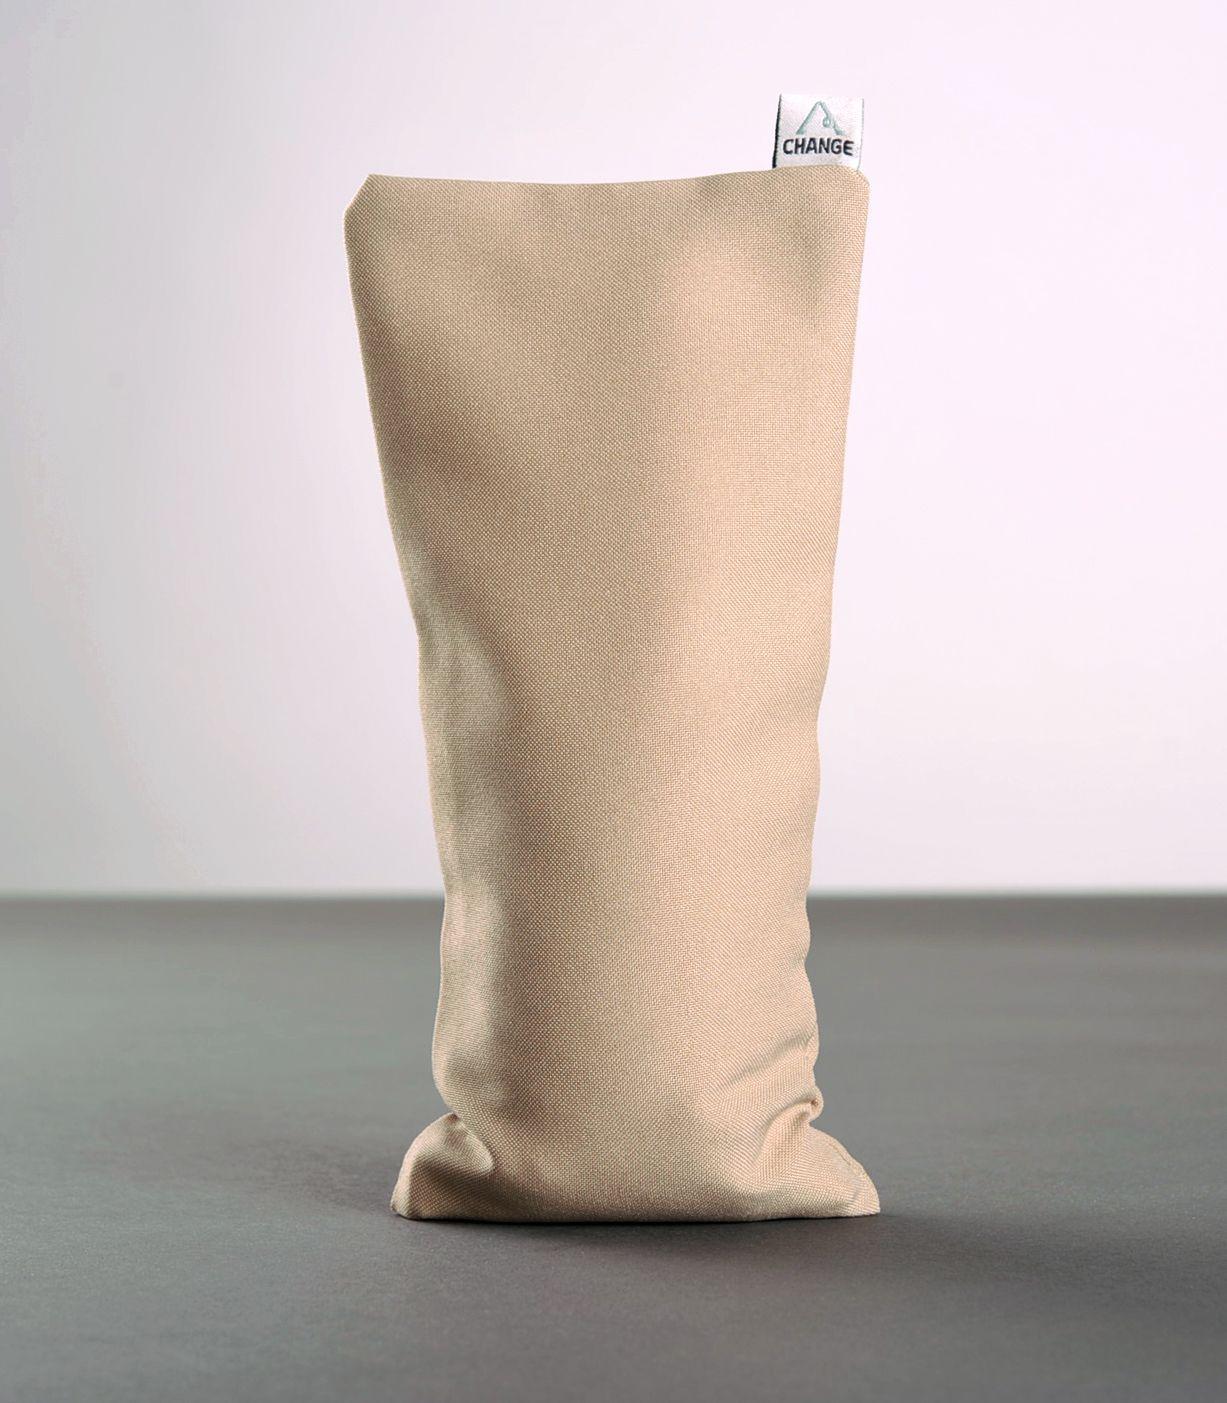 Yoga pillow with quartz sand photo 4